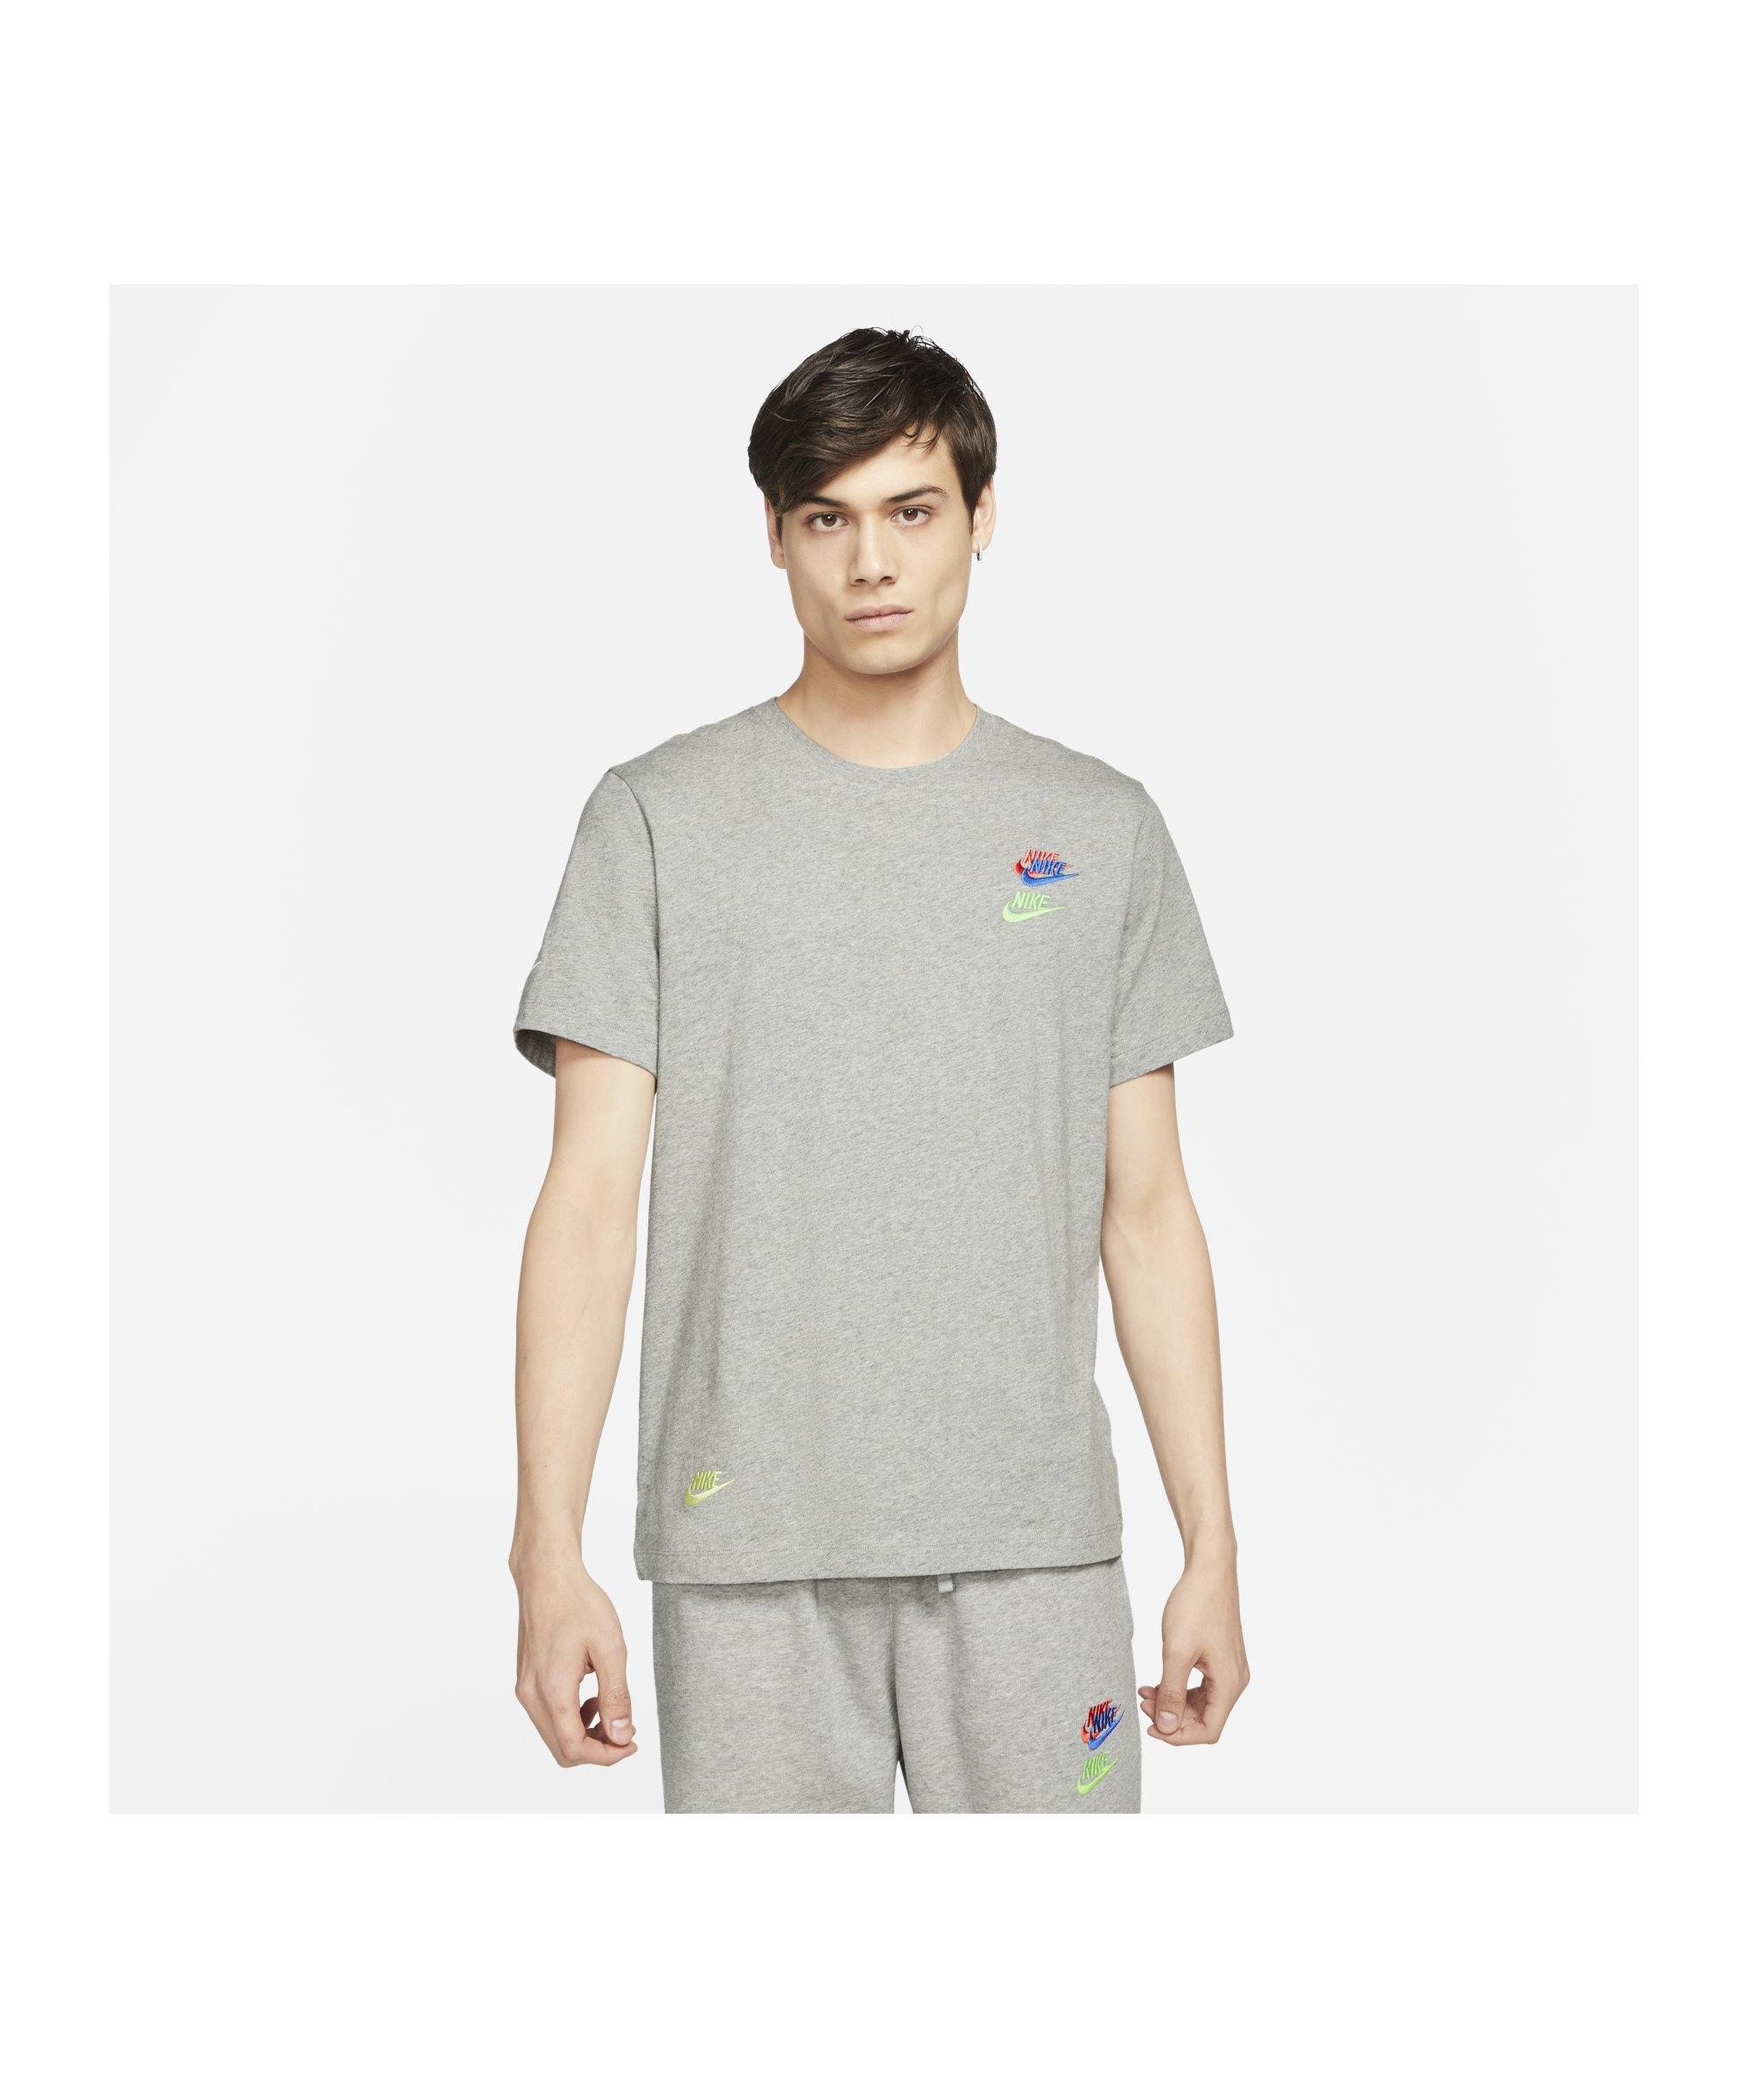 Nike Sportswear T-Shirt Grau F063 - grau